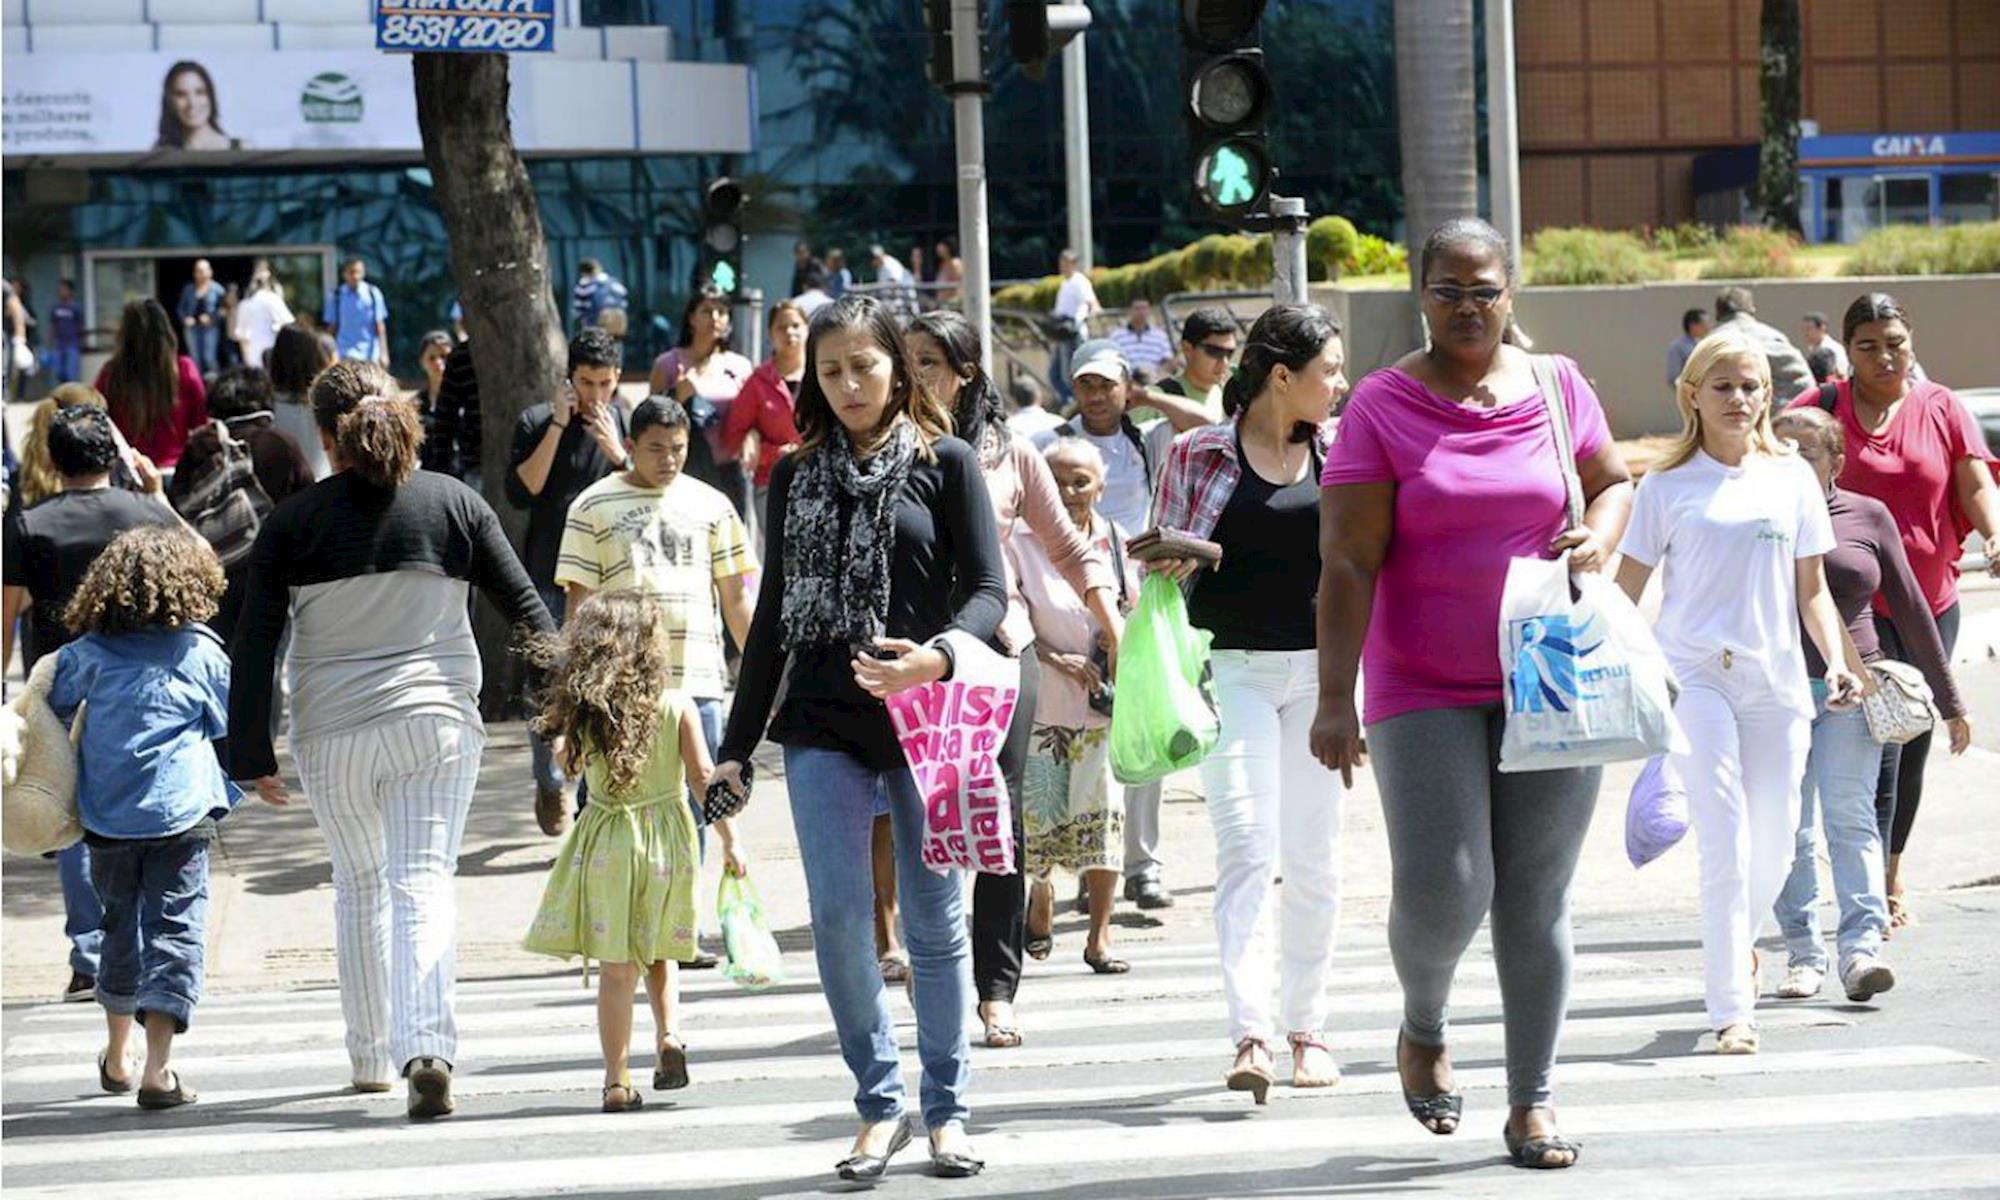 desemprego, emprego, ibge,  AGÊNCIA BRASIL